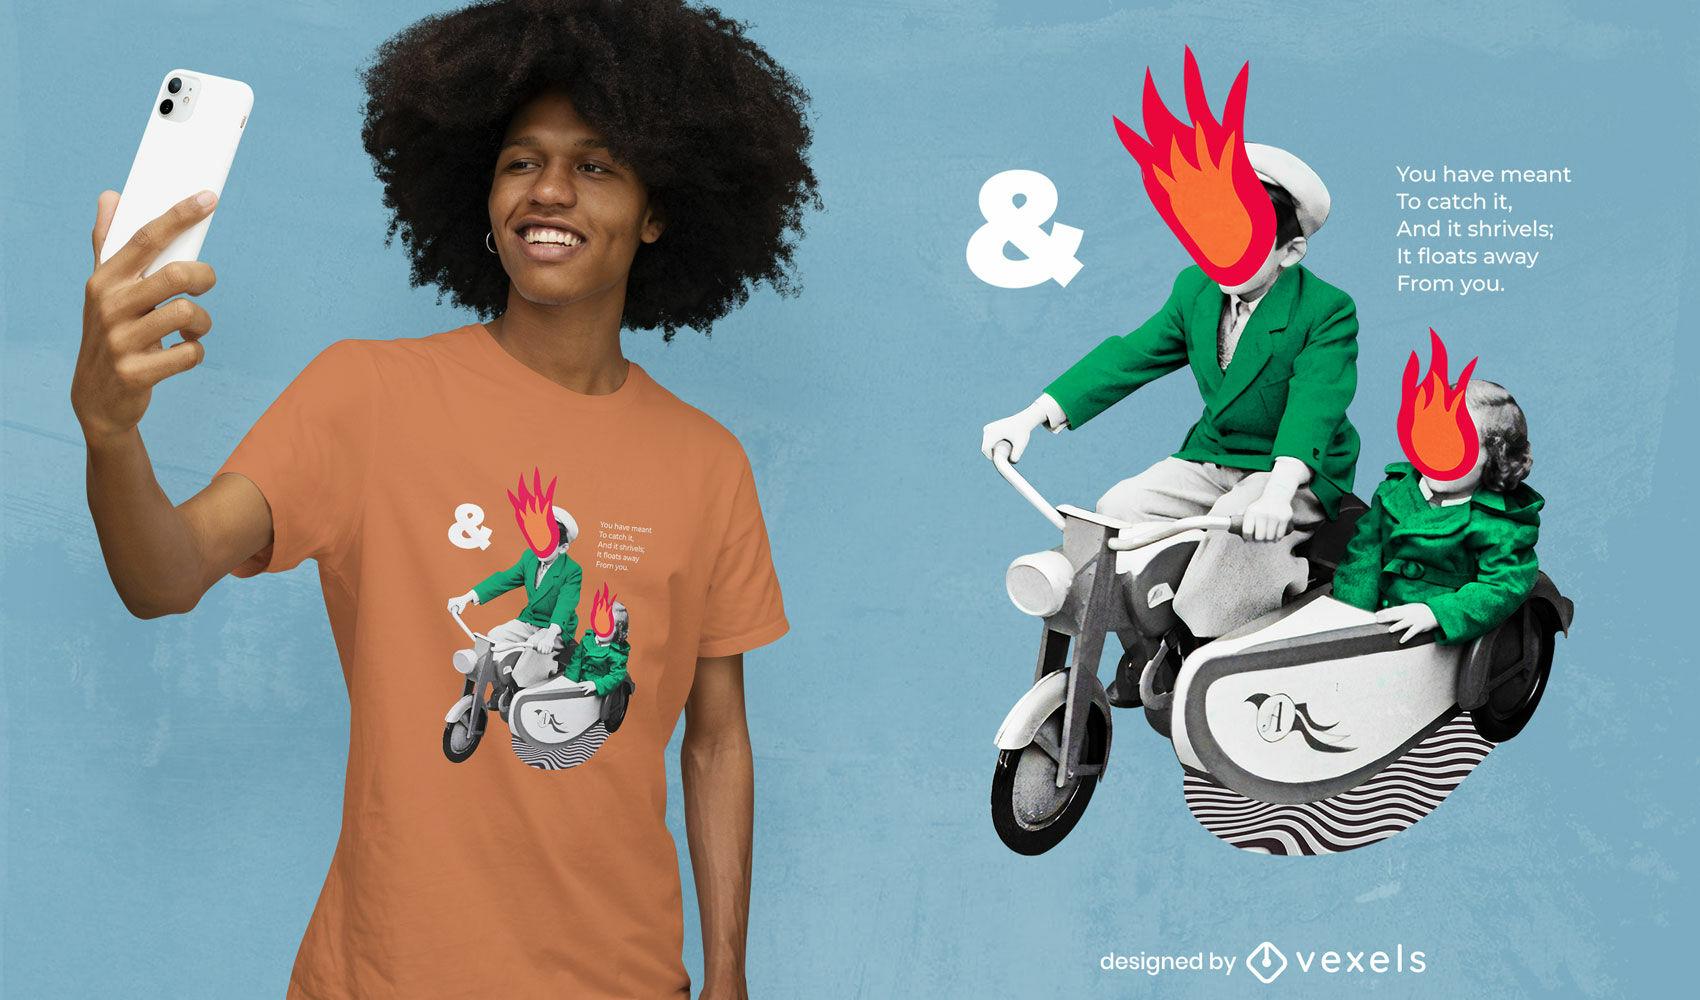 Diseño de camiseta psd de collage de hombre de moto